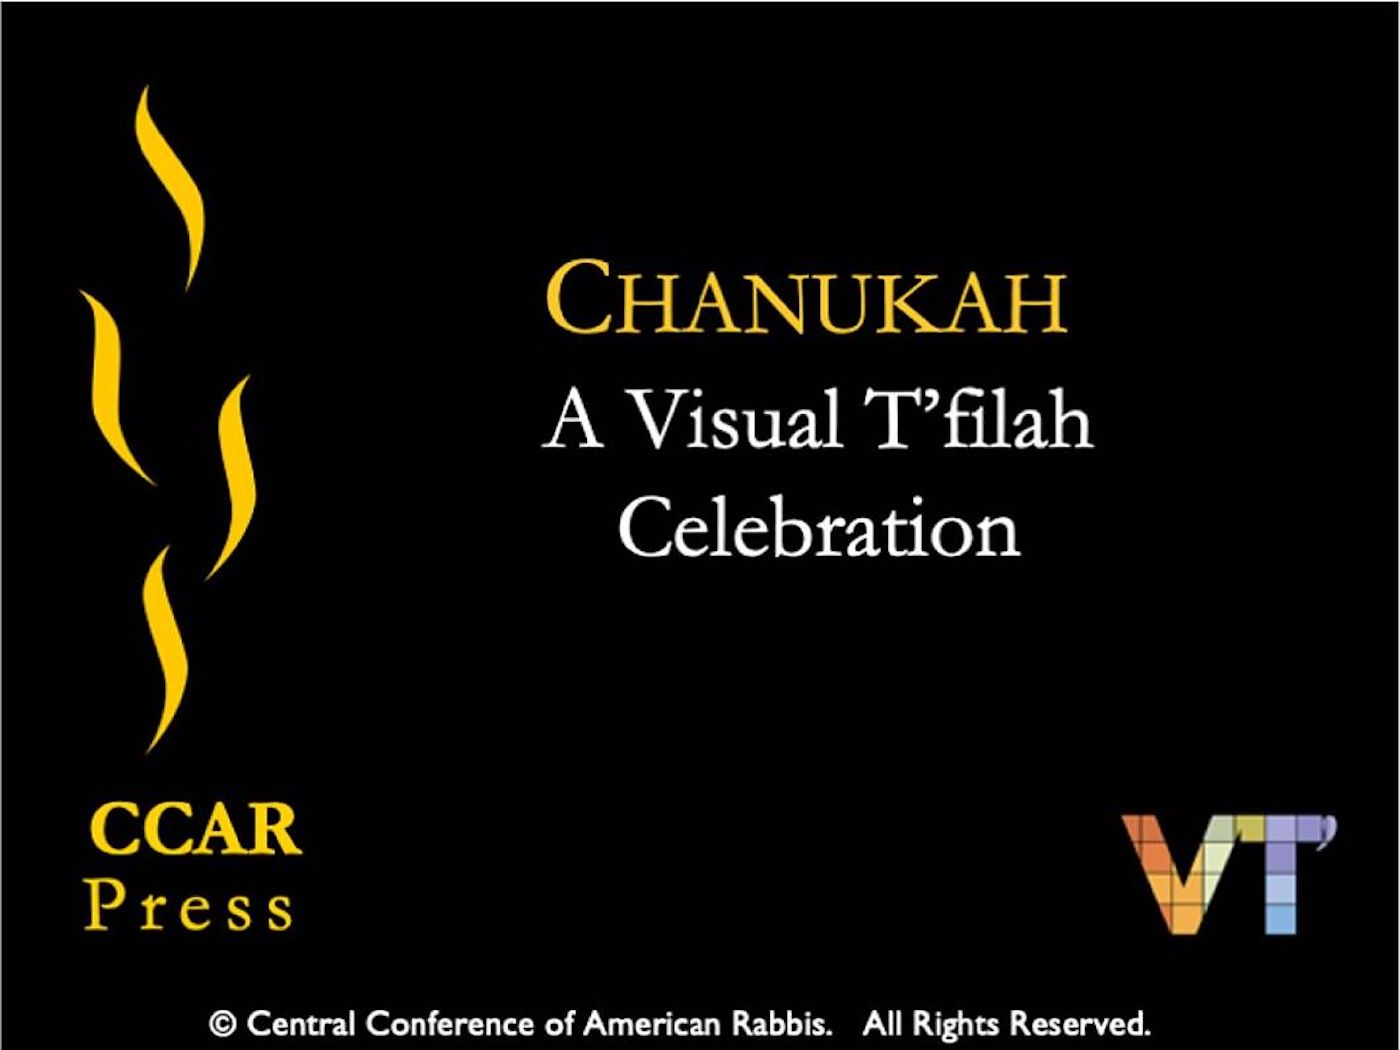 Chanukah: A Visual T'filah Celebration